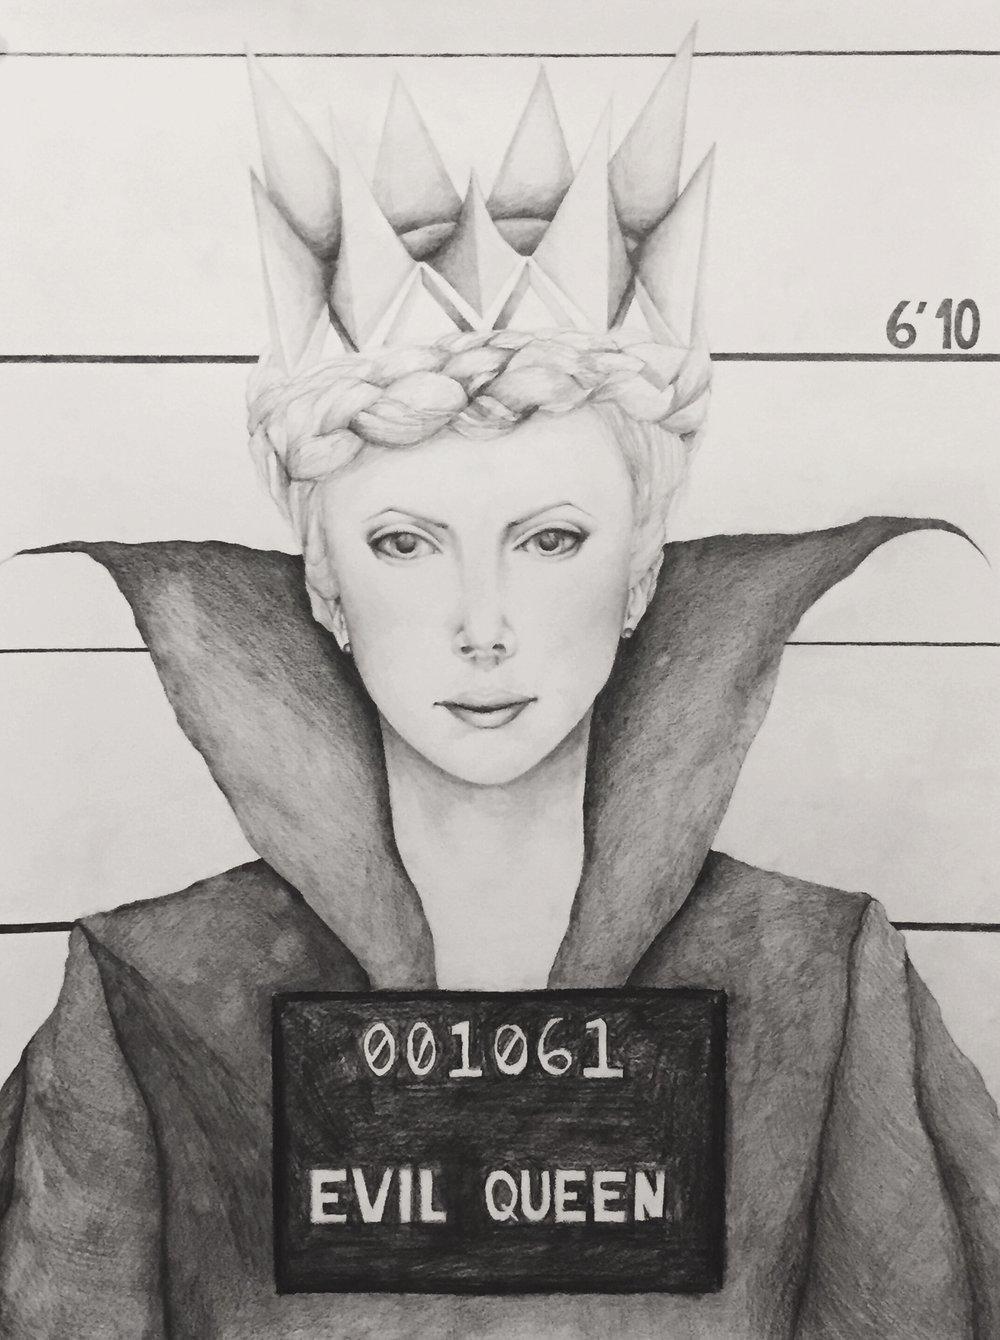 Evil Queen's Mugshot